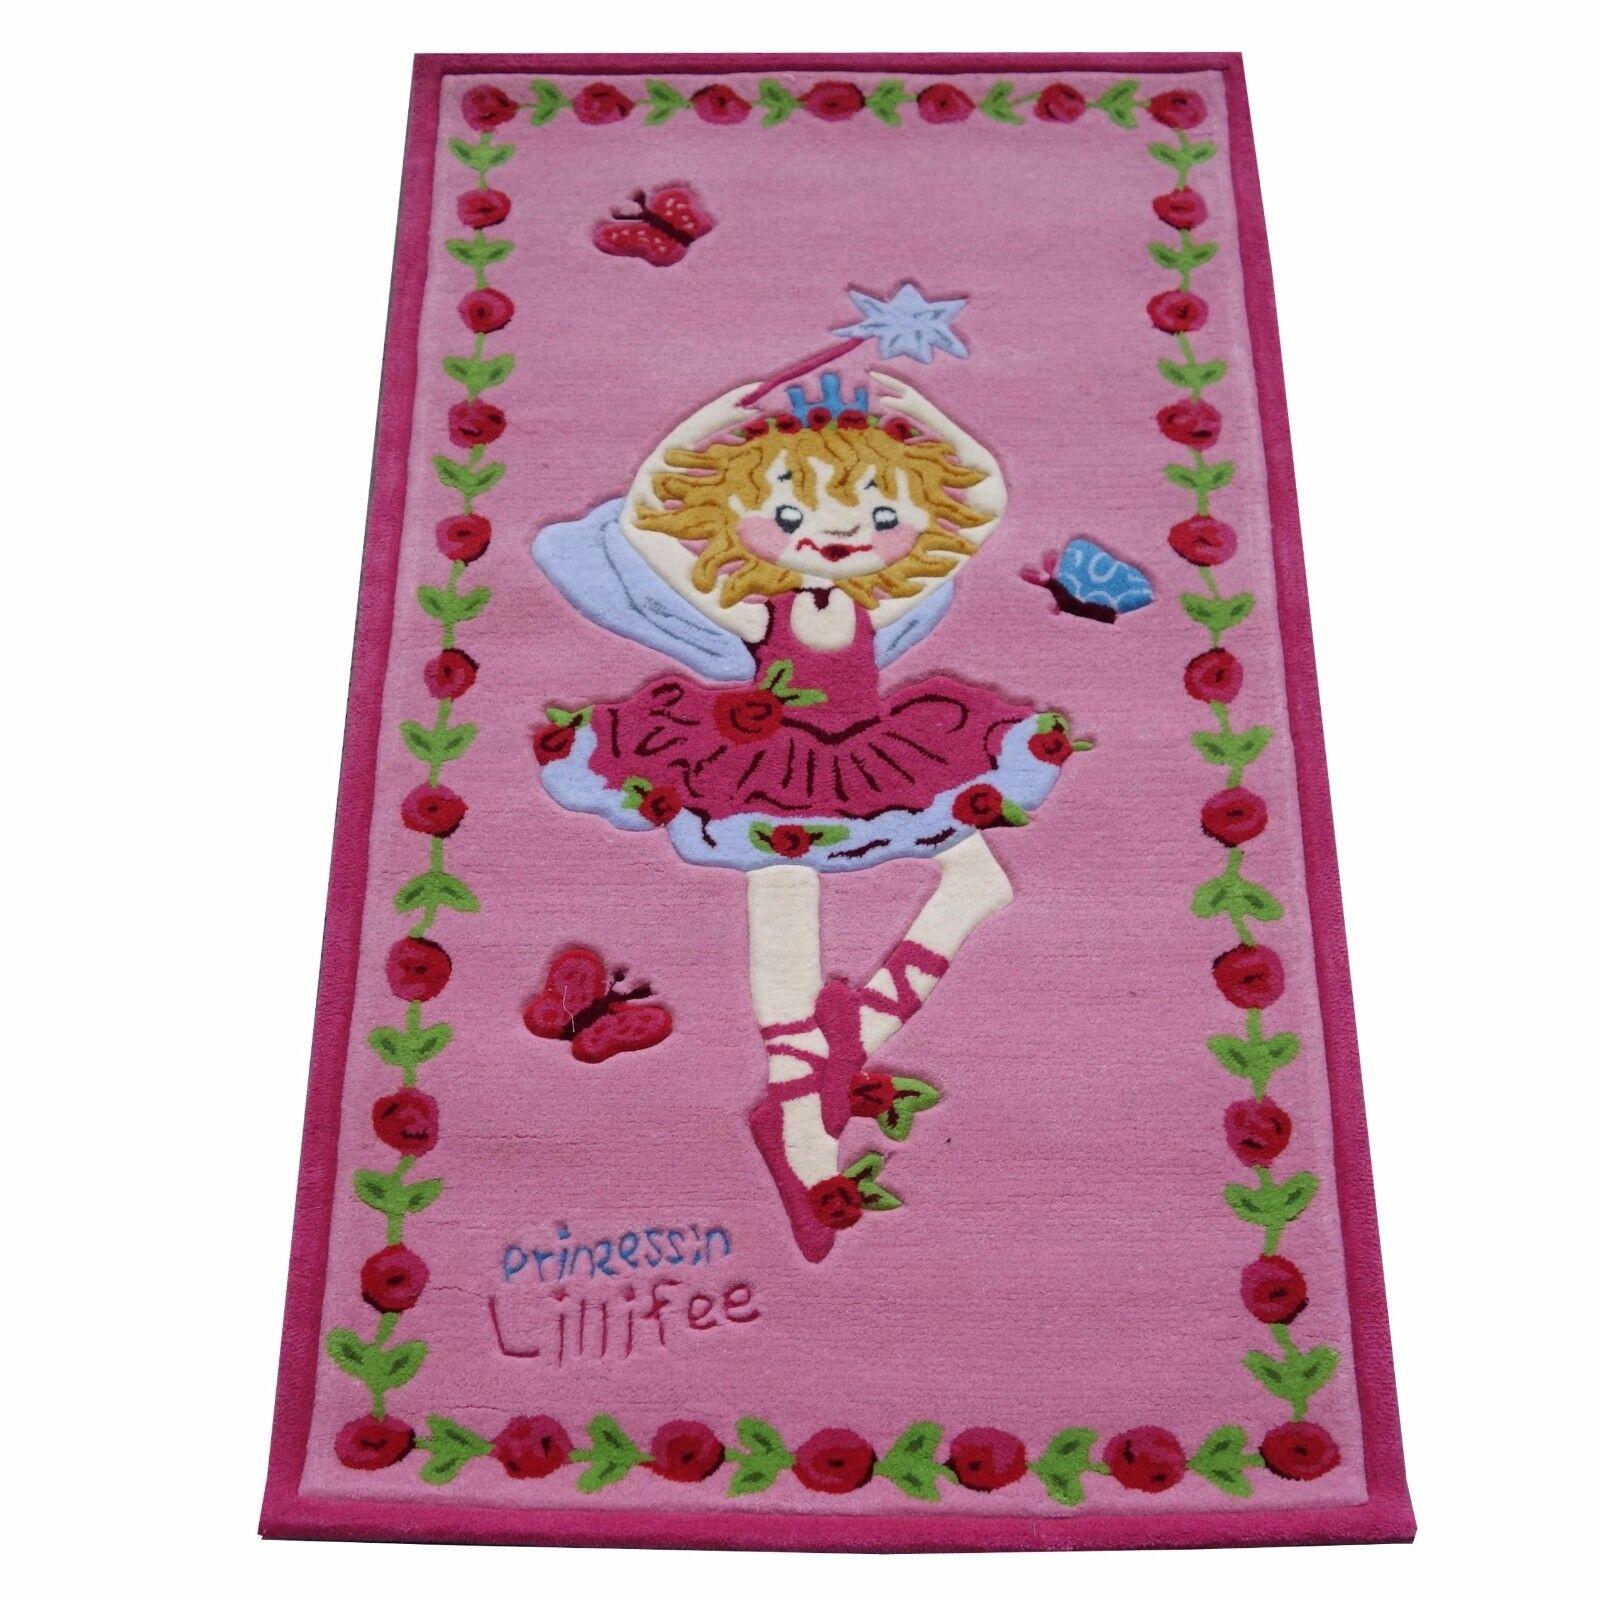 Tapis  Princesse Lillifee li2200-01  Handtuft kinderpielteppich 80x150 NEUF